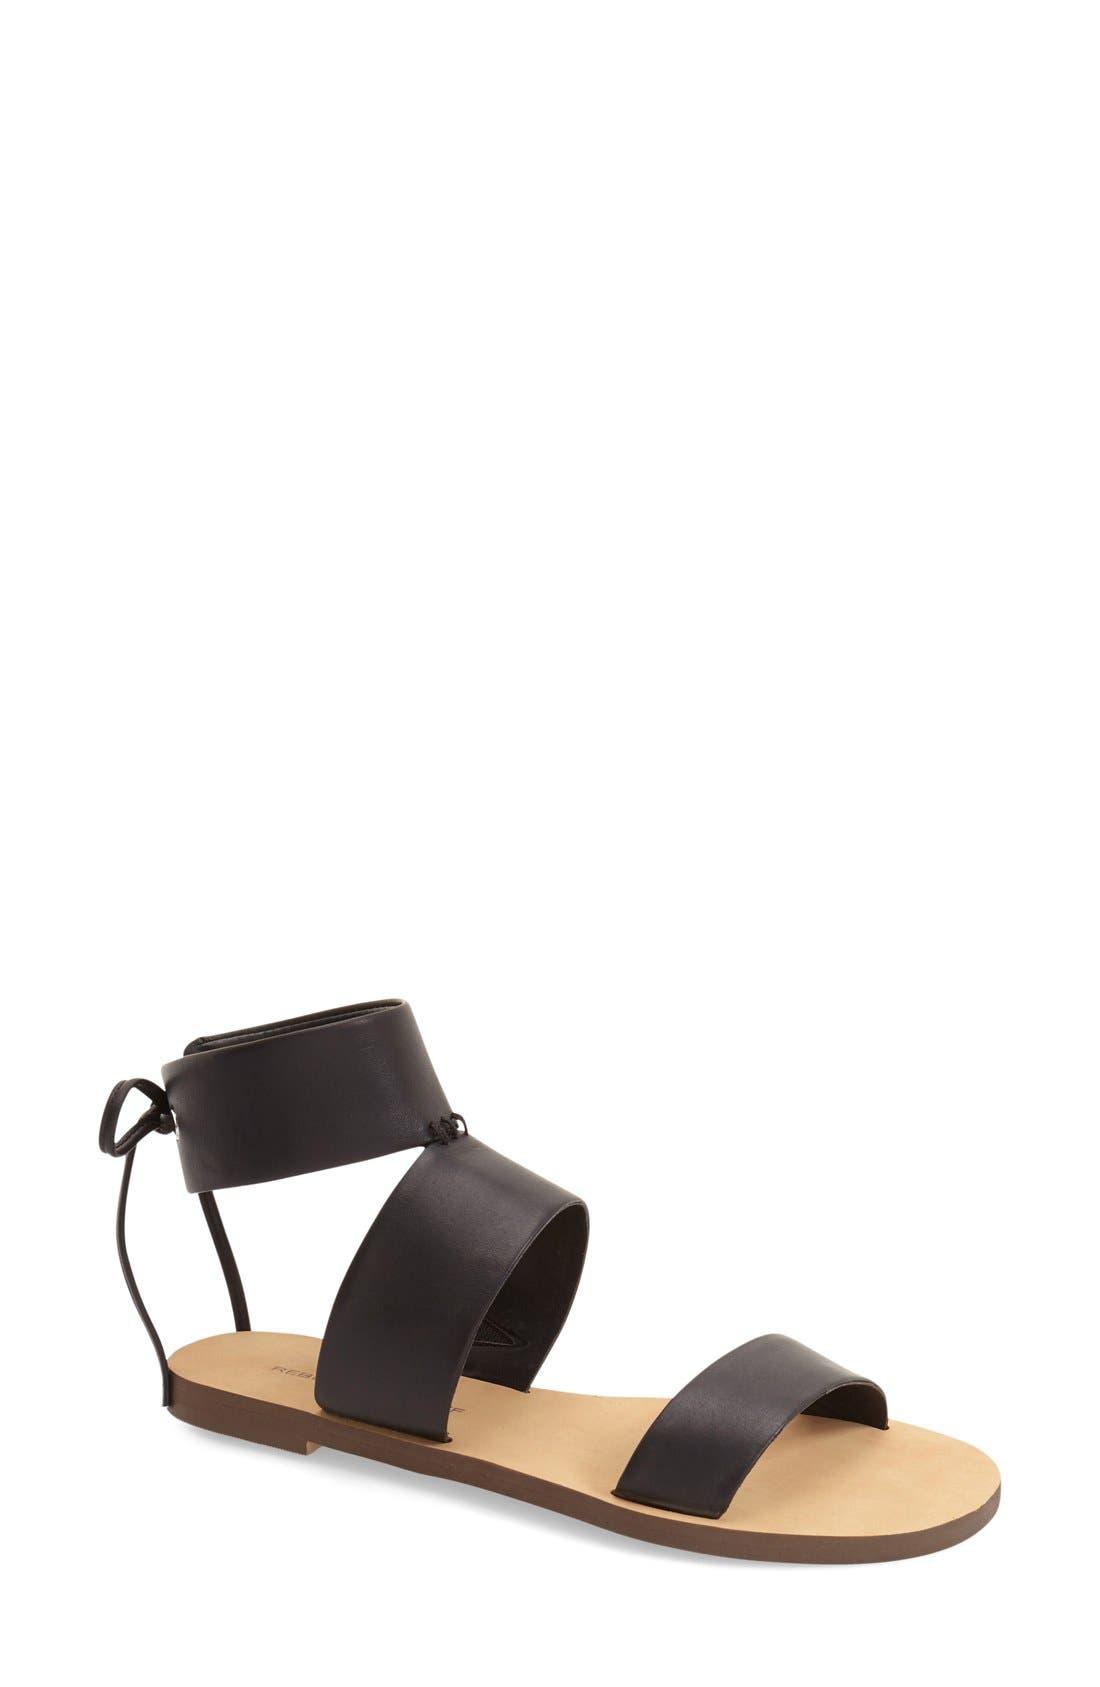 'Emma' Ankle Cuff Sandal,                             Main thumbnail 1, color,                             001